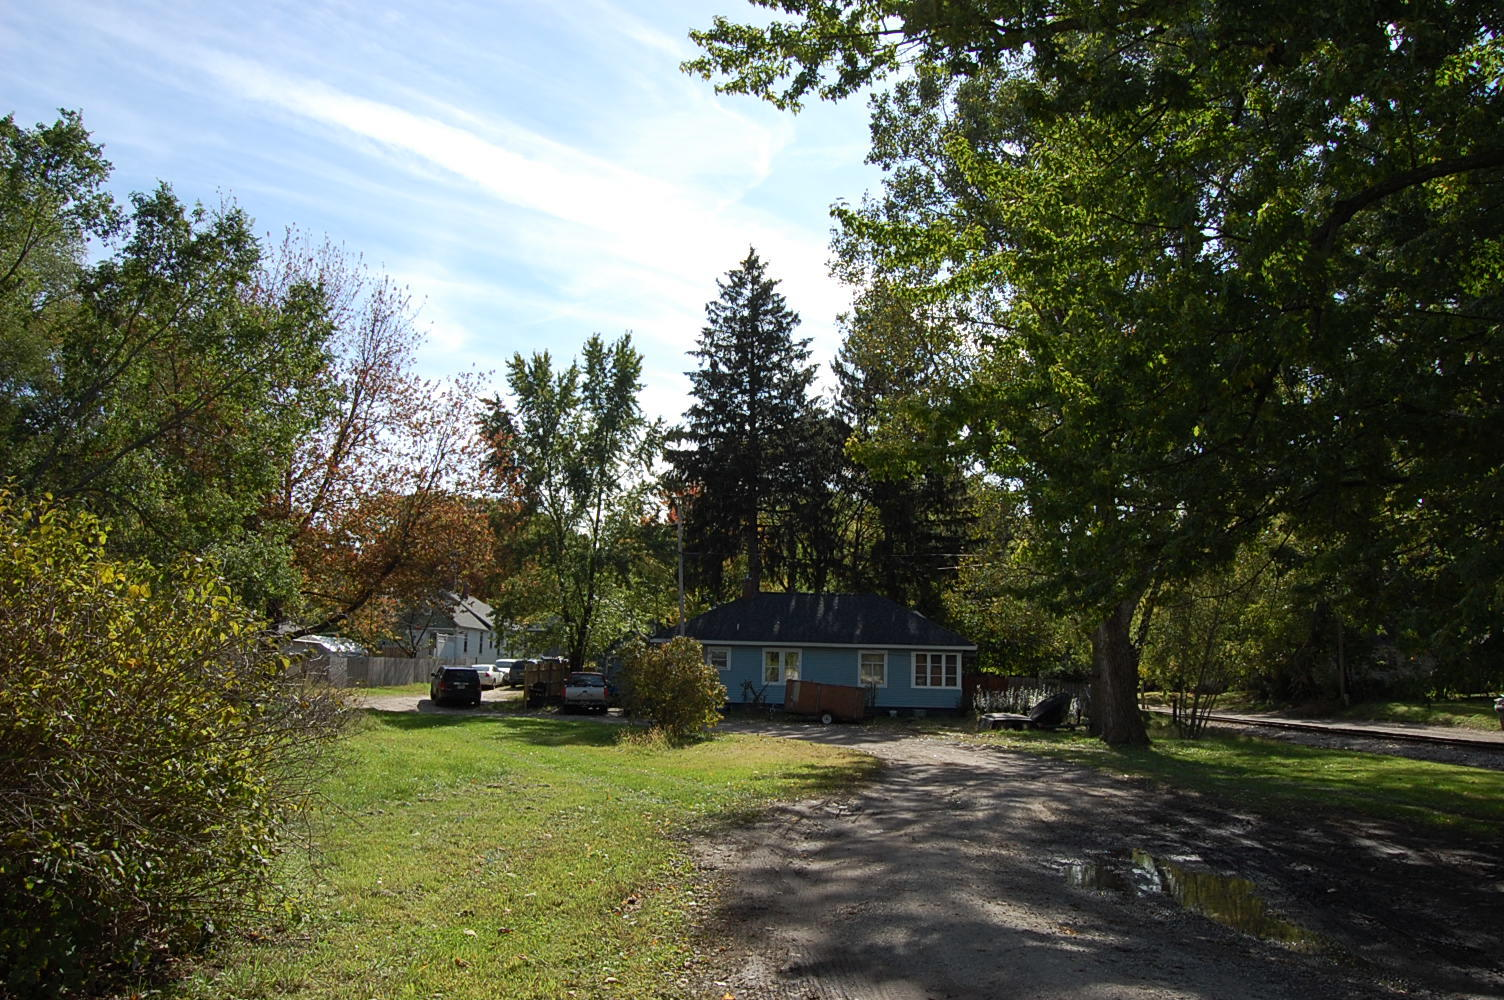 Large Lot in Nice Neighborhood Near Lake Michigan - Image 6